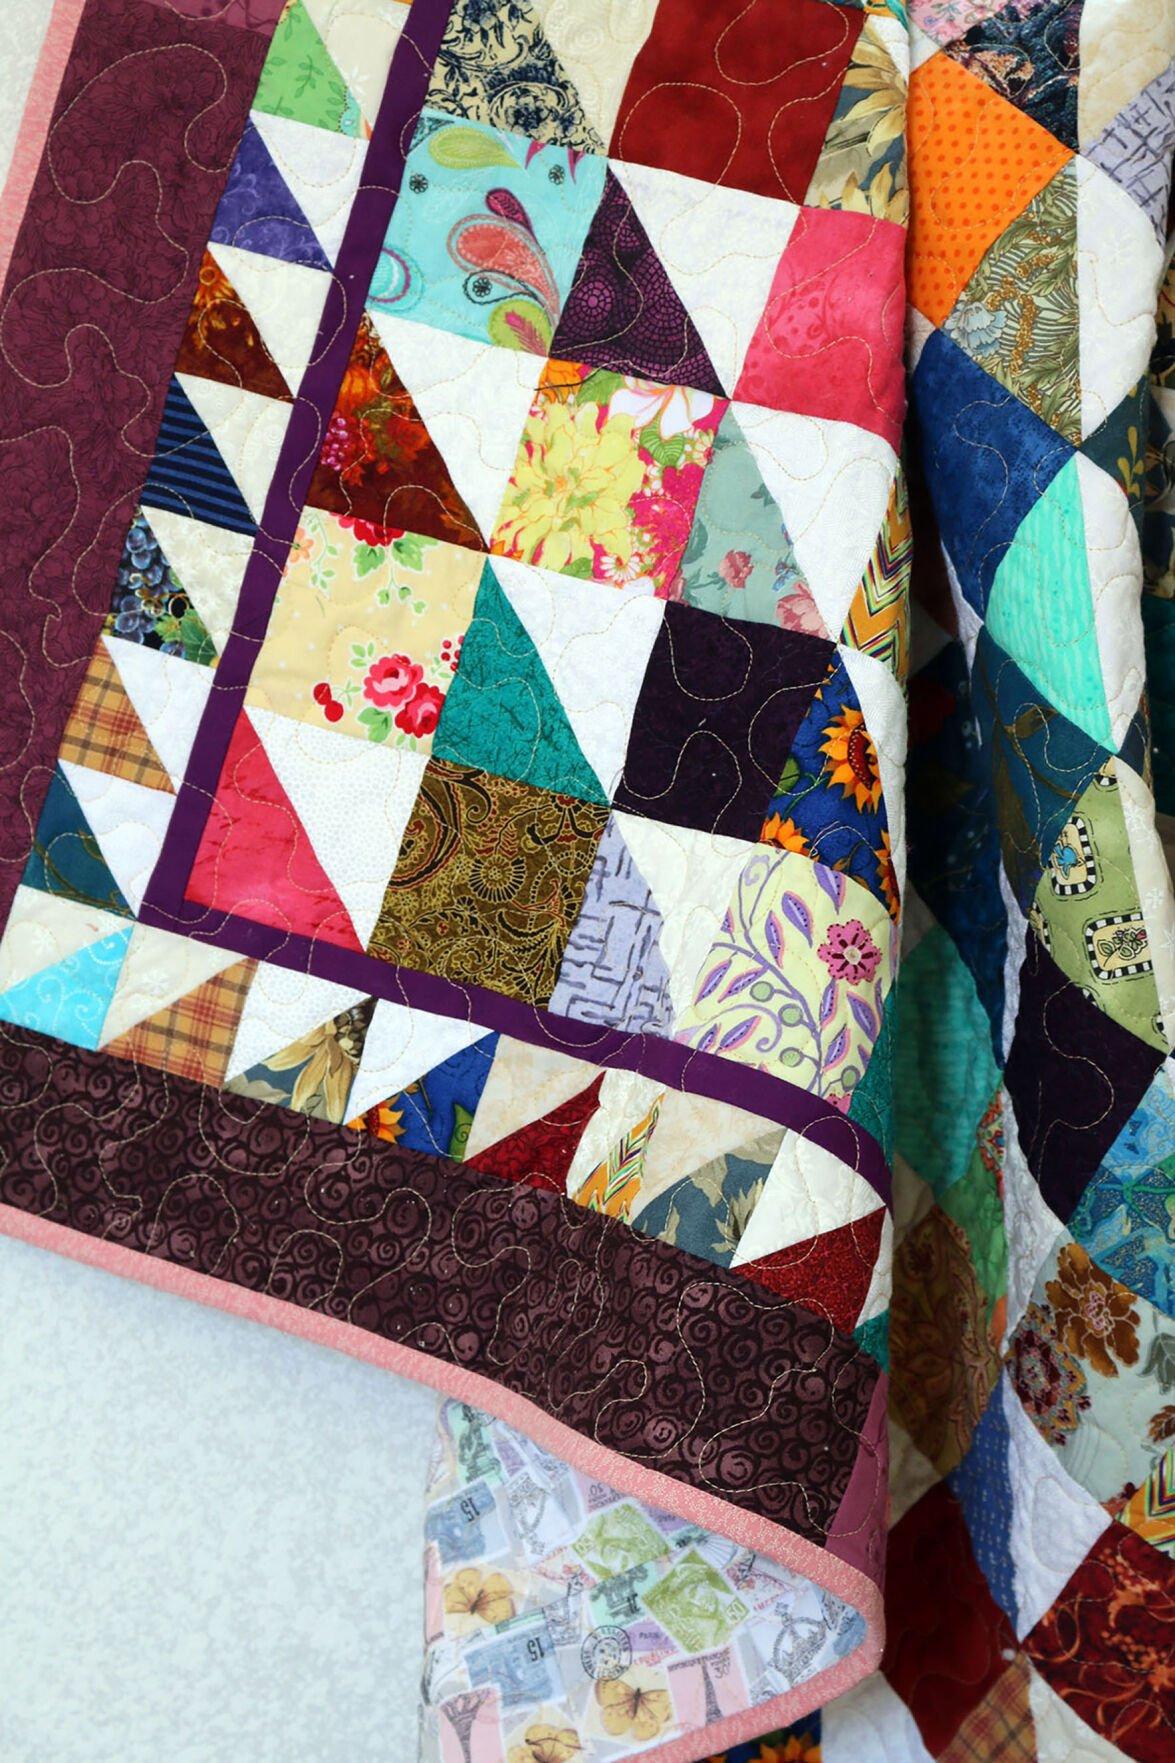 Quilt, Handmade by Debra Heltzel